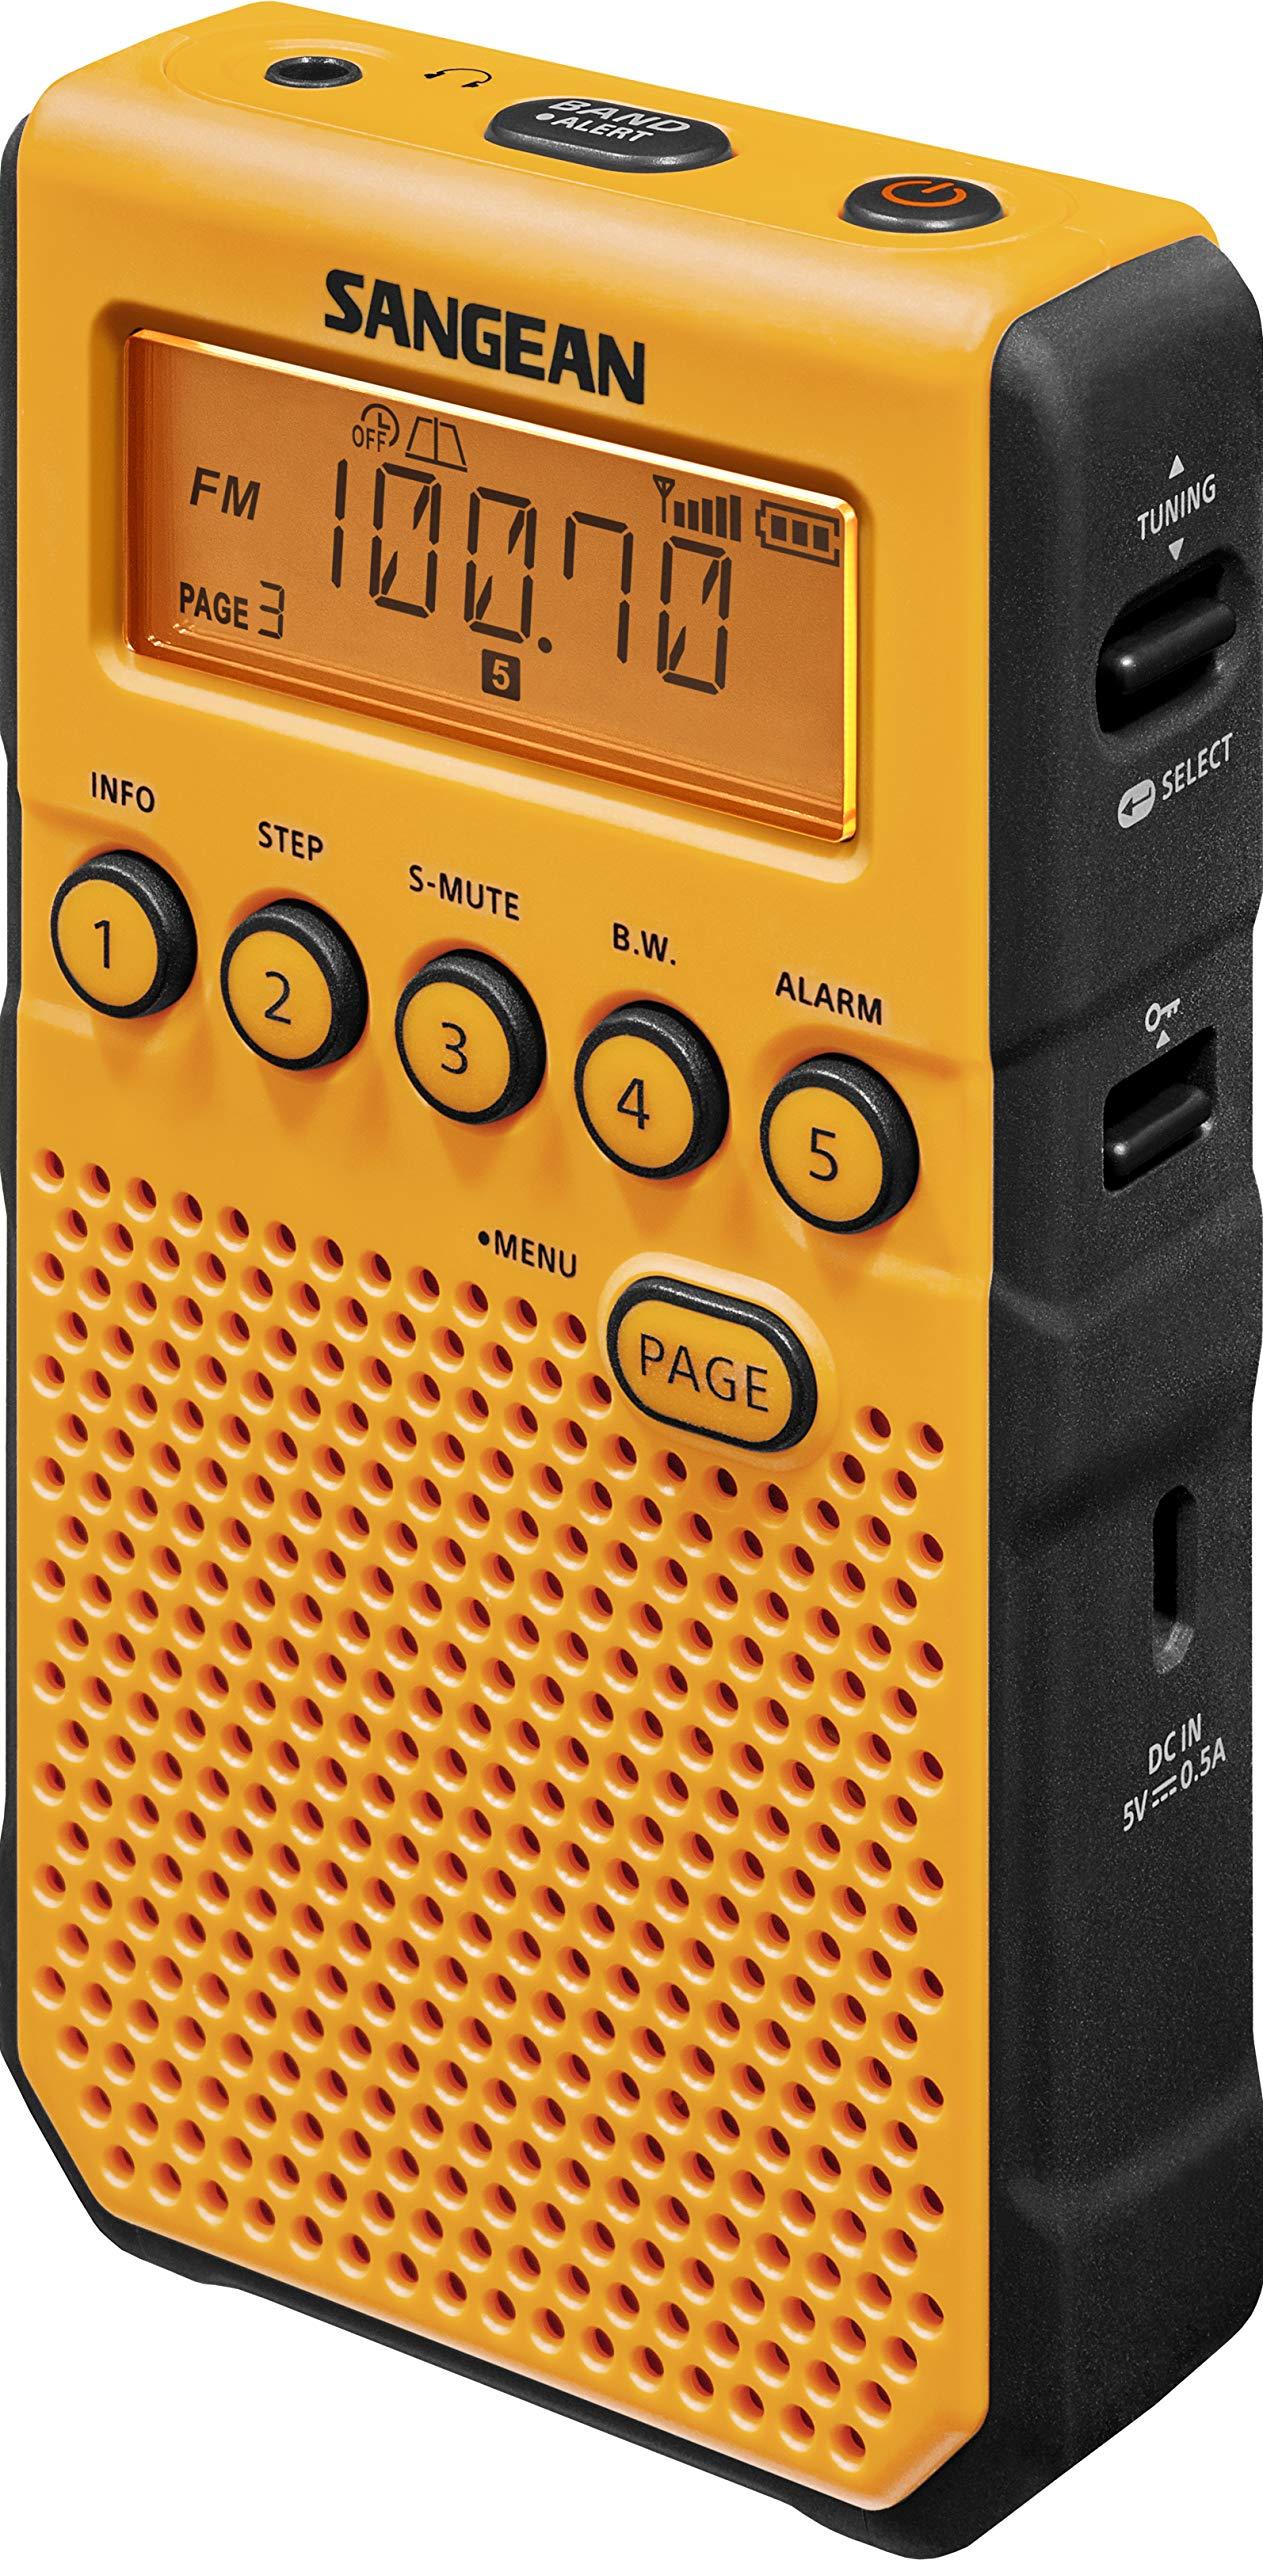 Sangean DT-800YL AM / FM / NOAA Weather Alert Rechargeable Pocket Radio (Yellow) by Saugeen America, Inc. (Image #3)